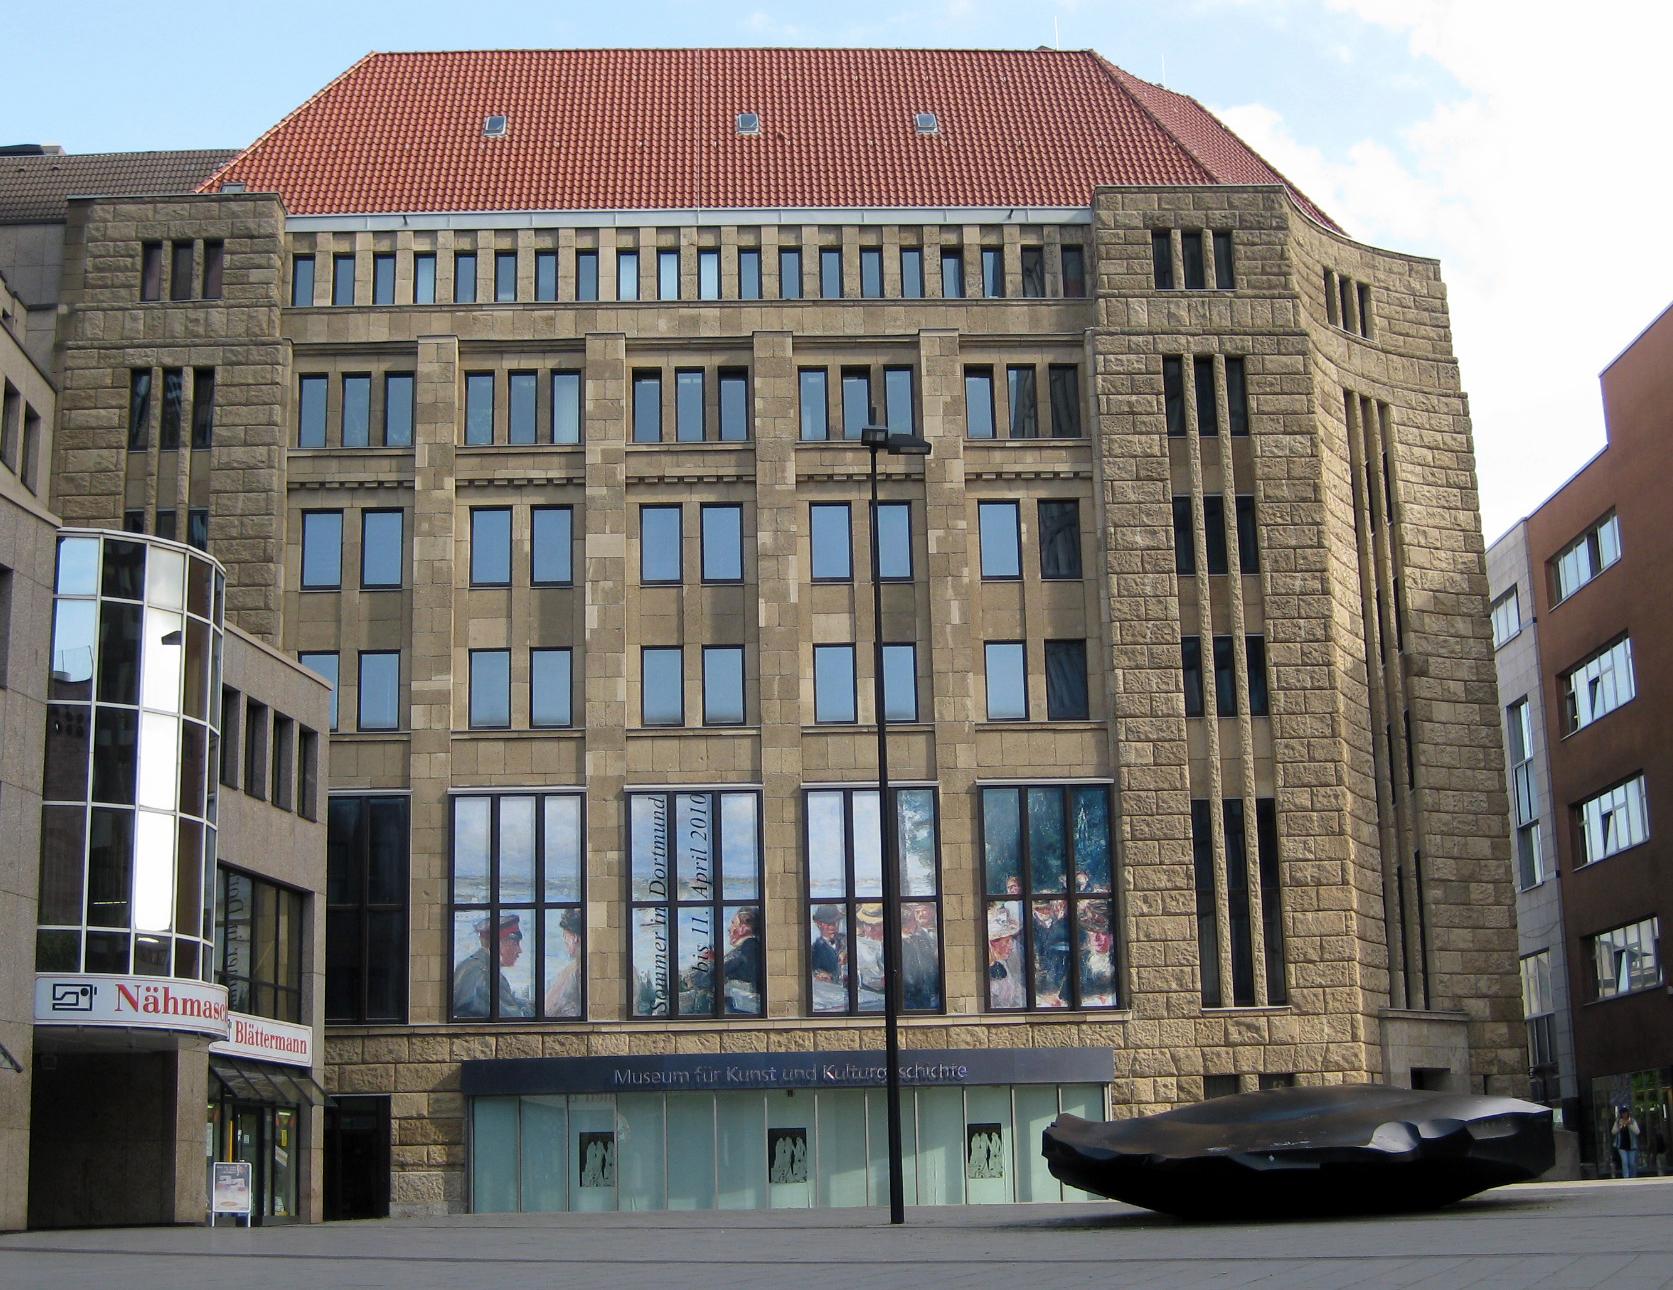 Kurzportrat Das Museum Museum Fur Kunst Und Kulturgeschichte Museen Freizeit Kultur Tourismus Stadtportal Dortmund De